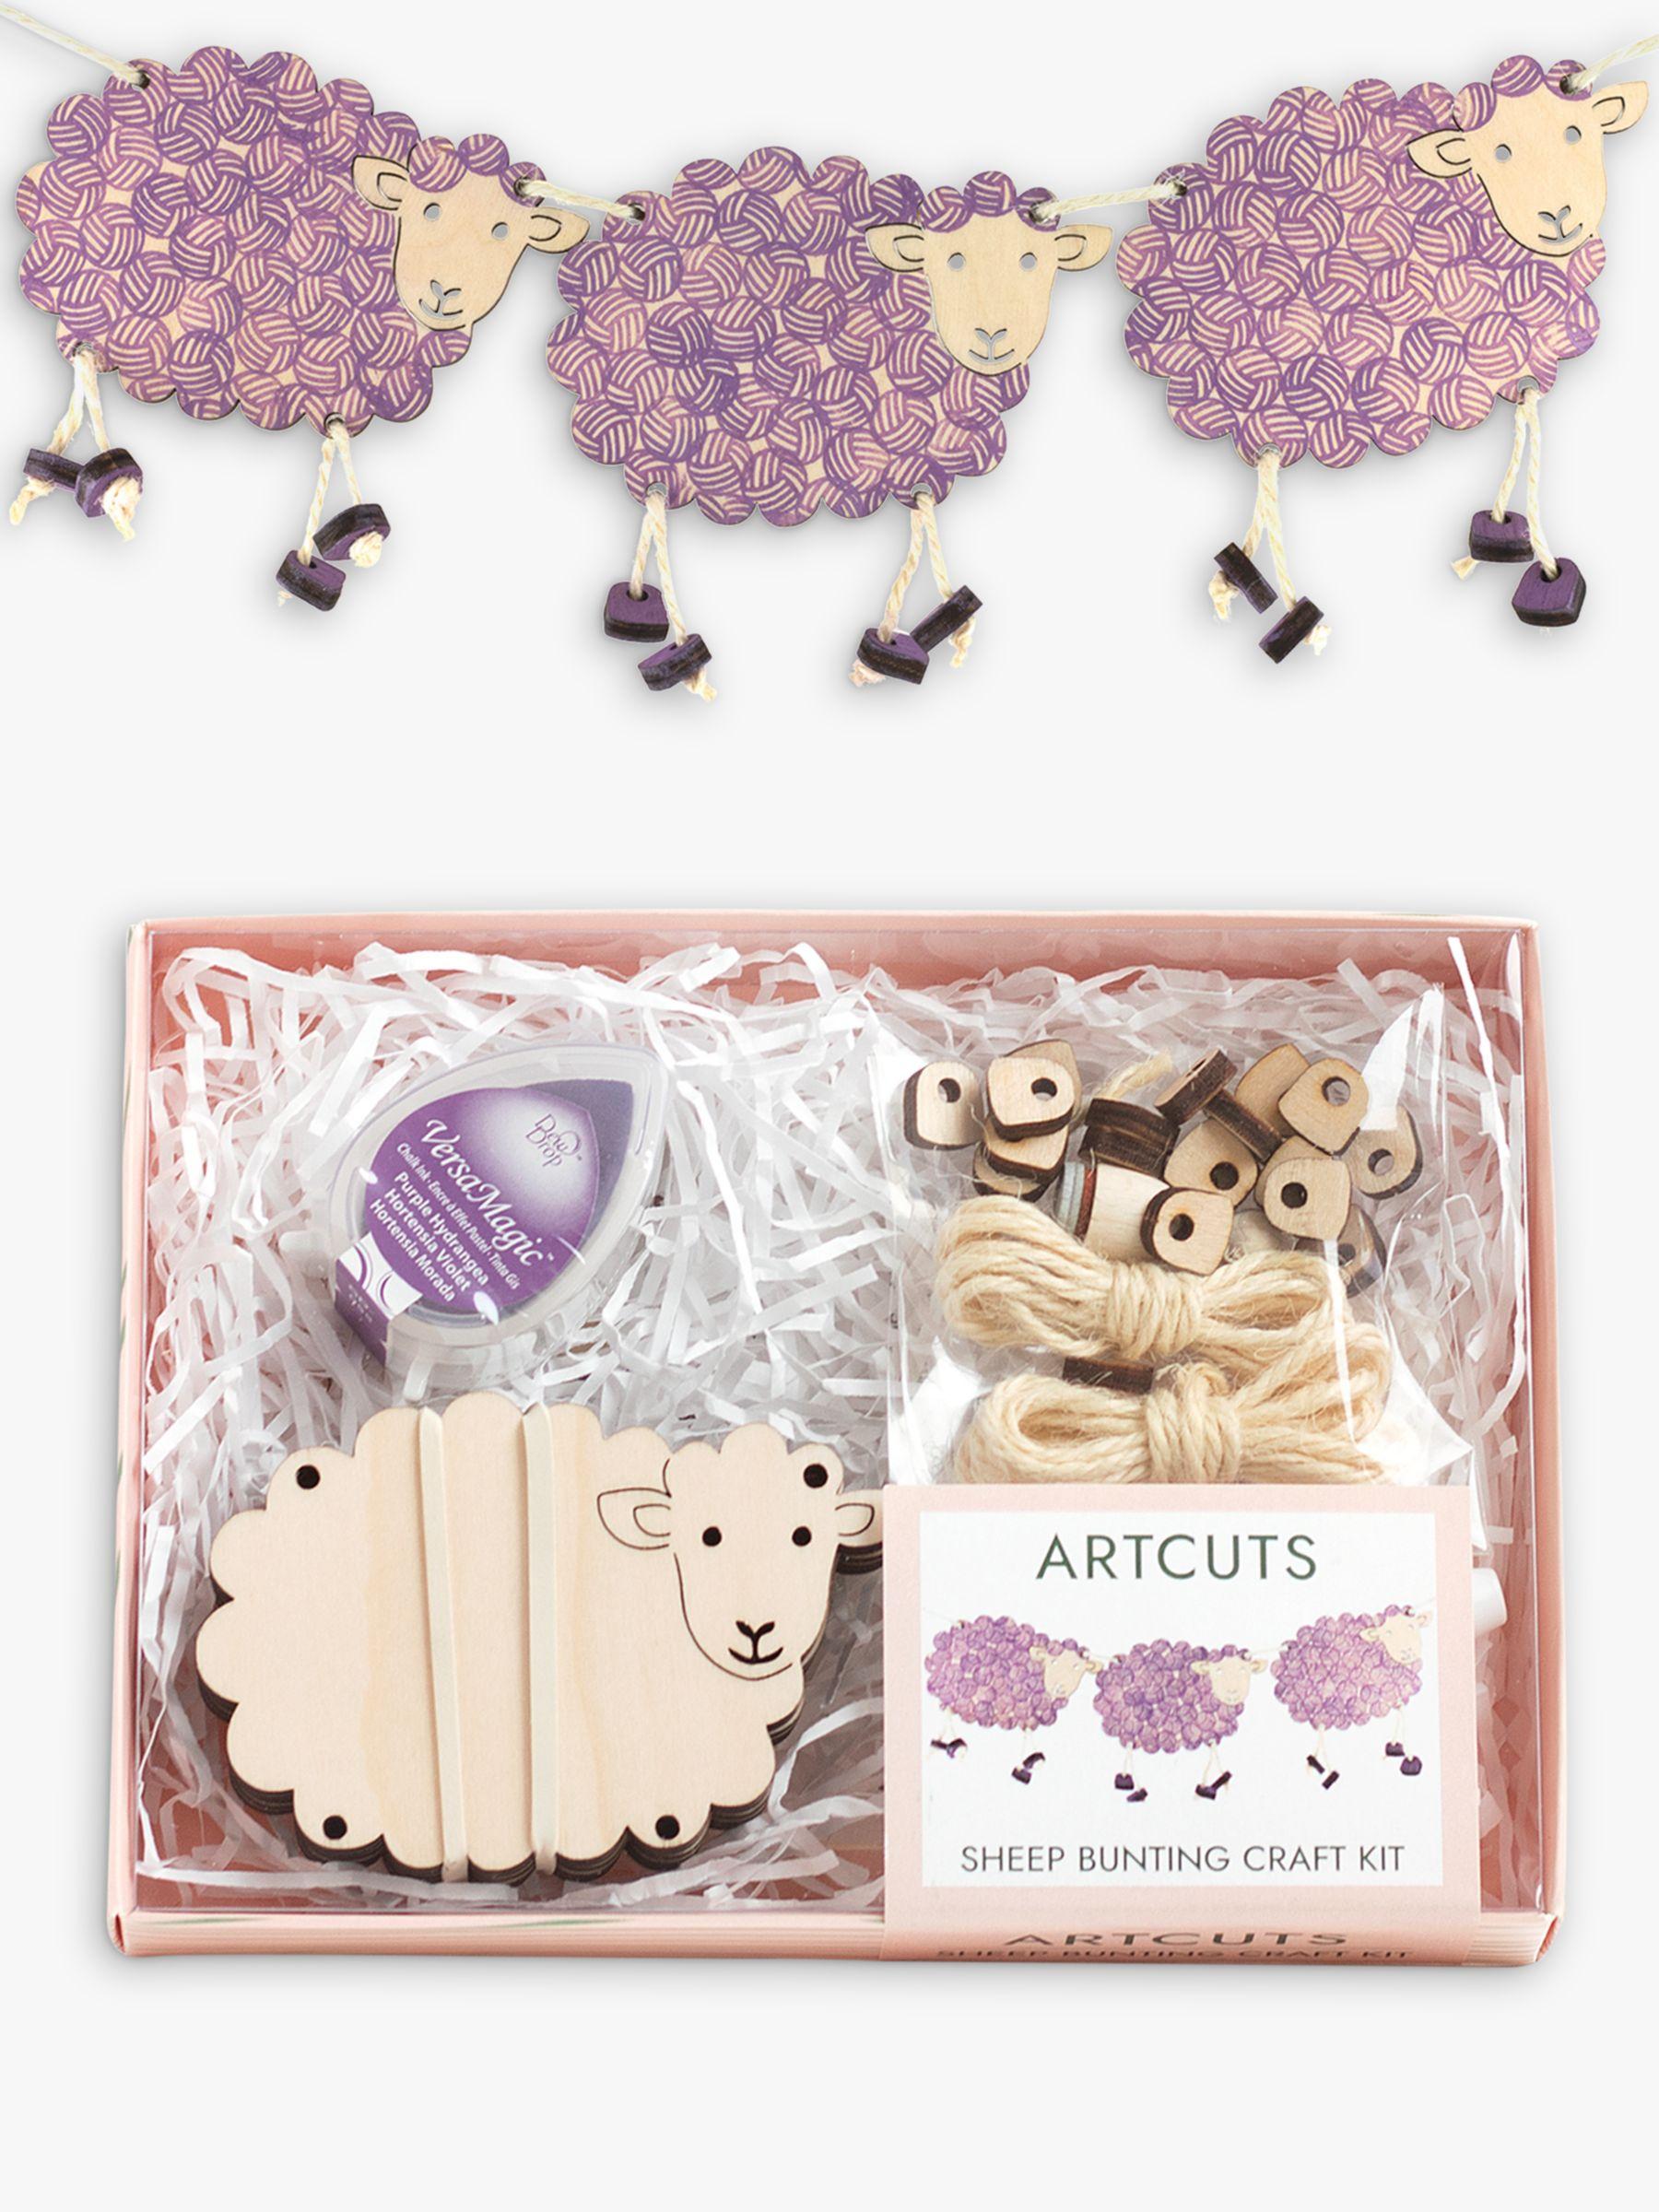 Artcuts Wooden Sheep Bunting Craft Kit